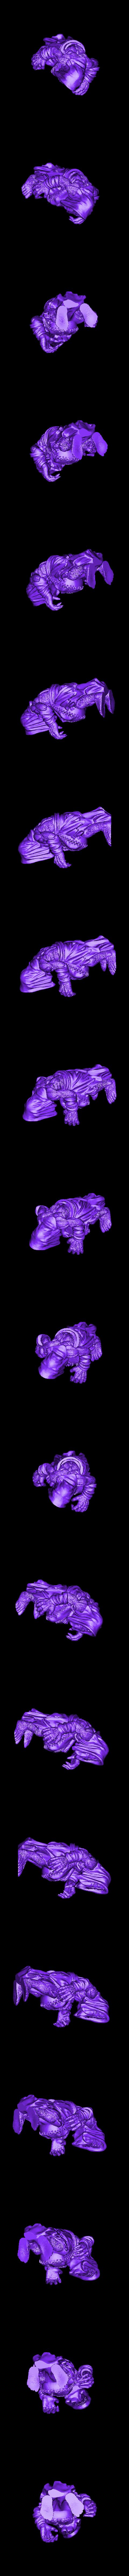 Crone2_v2.stl Download free STL file Witcher 3 Crone 2 • 3D printer design, DarkRealms